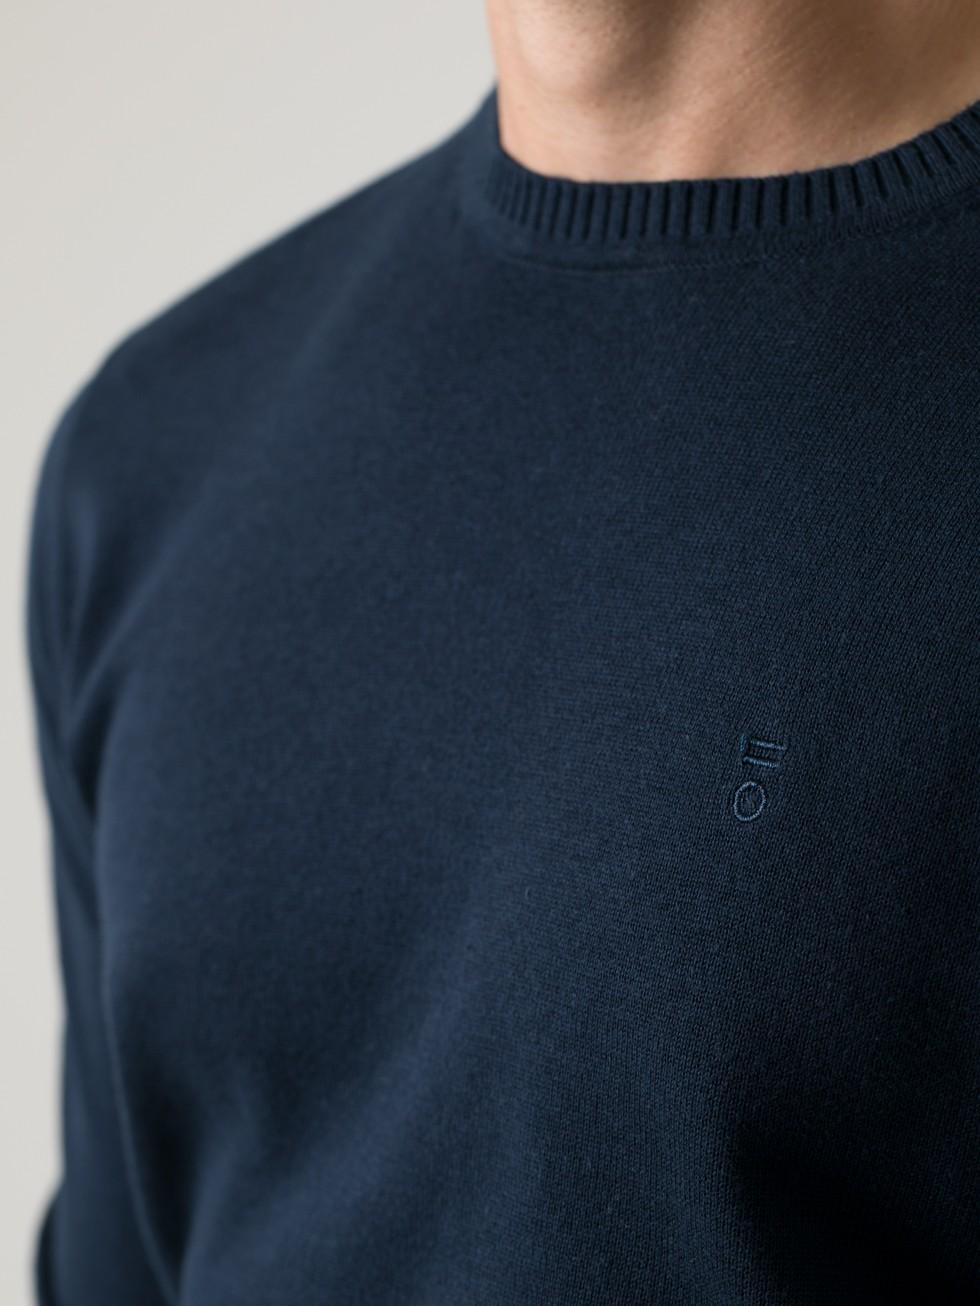 Jersey cuello caja navy